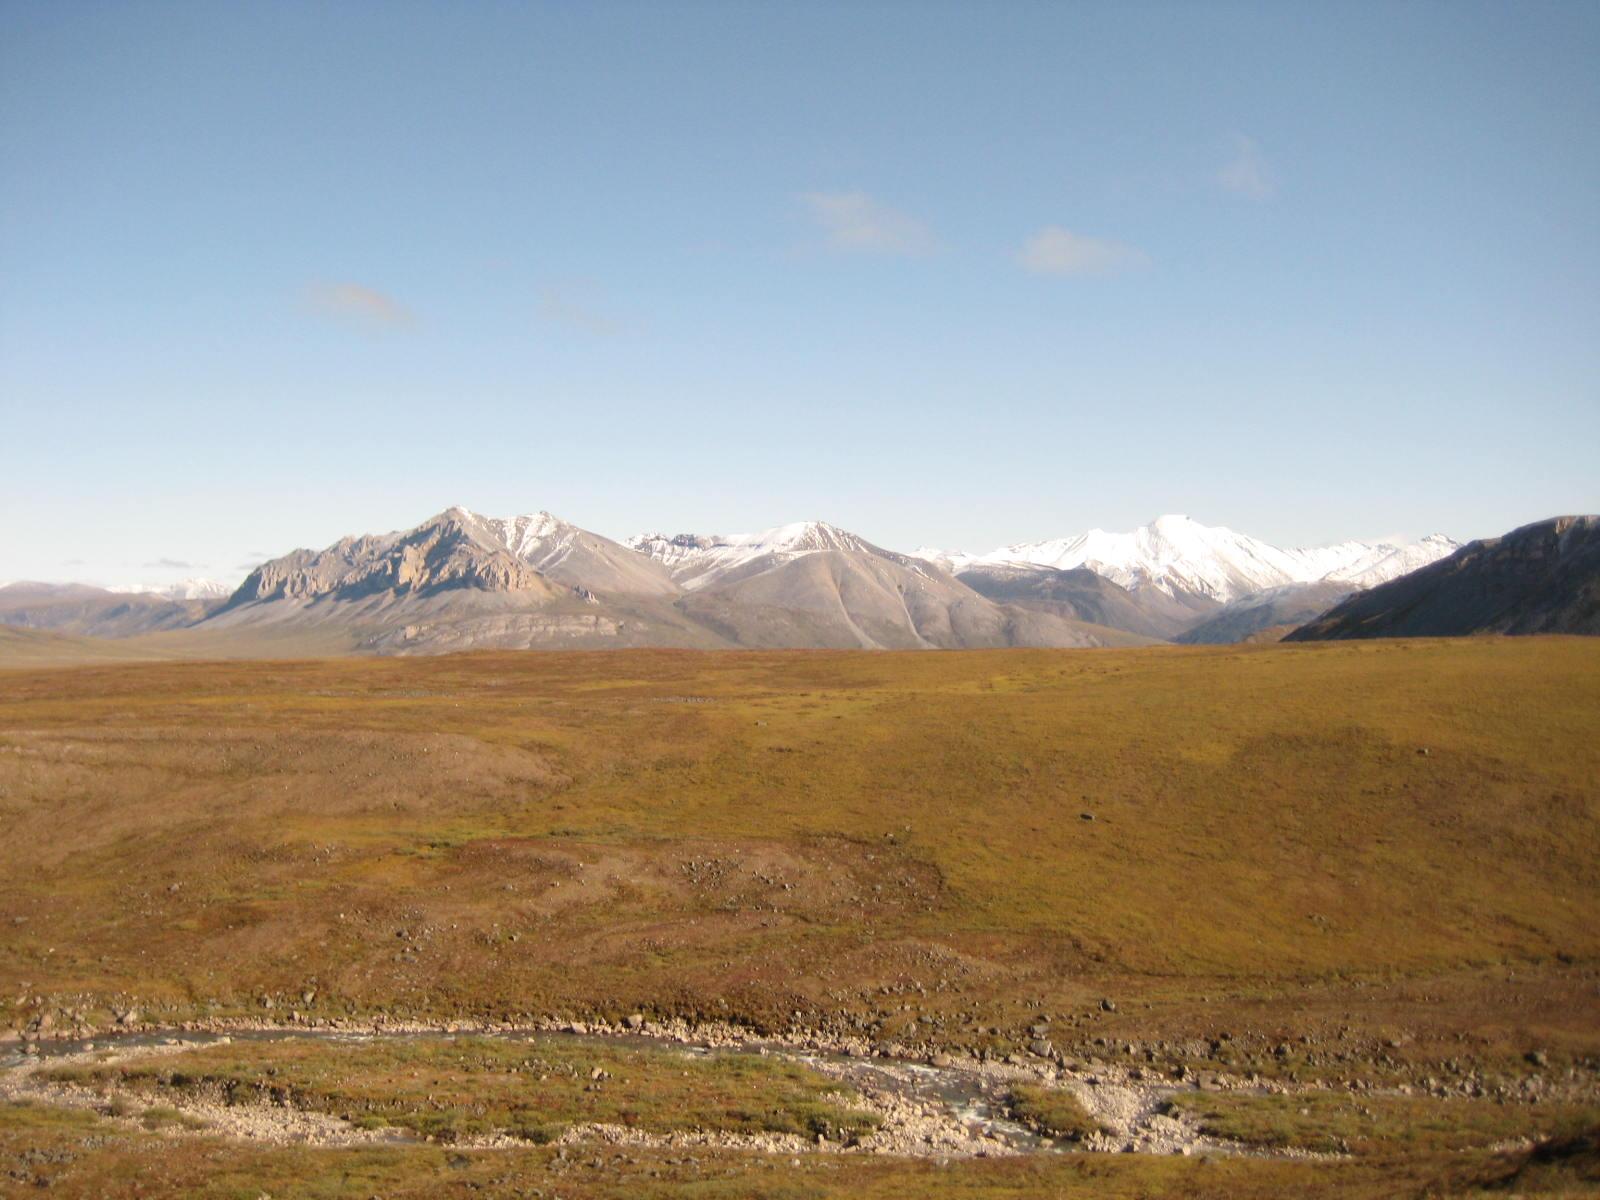 The sun may be shining bright, but the reddening tundra betrays the seasonal change that lurks around the corner.